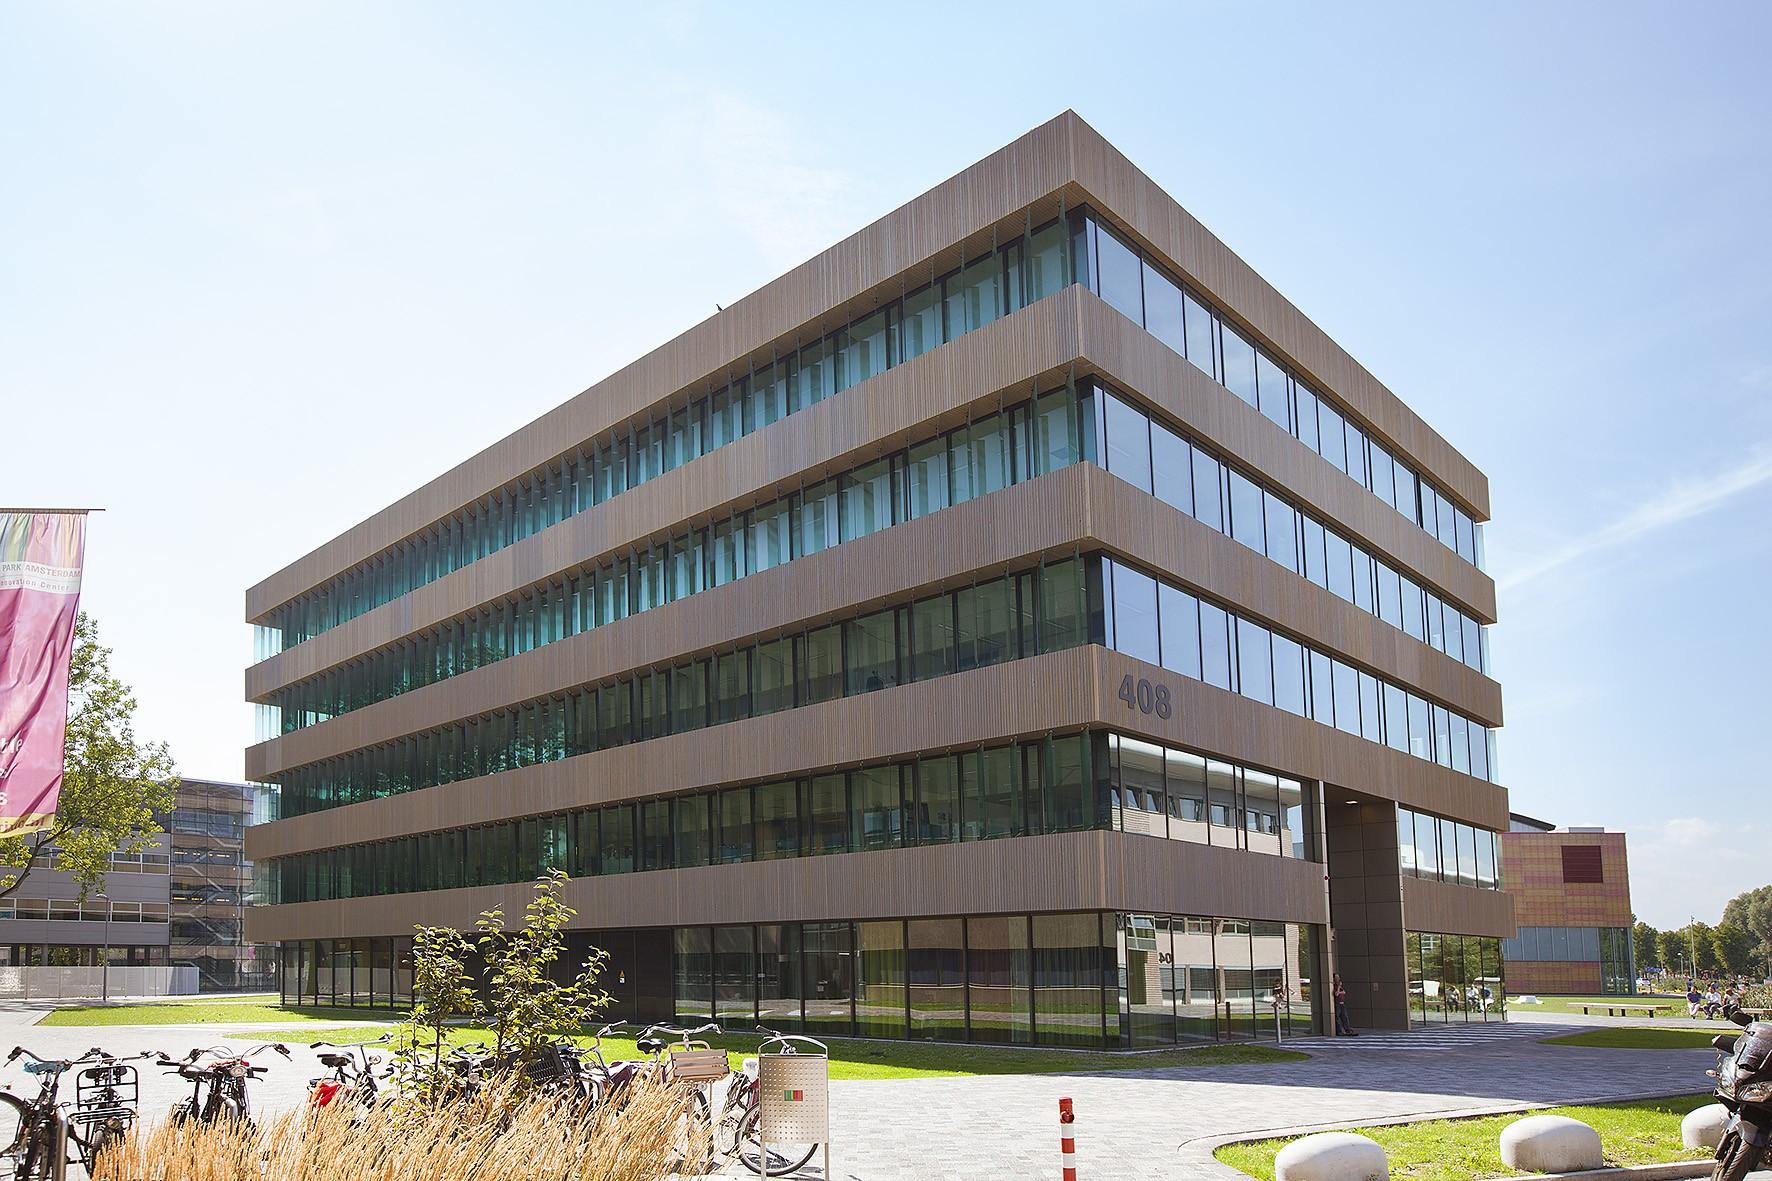 Amsterdam_Incubatorgebouw2